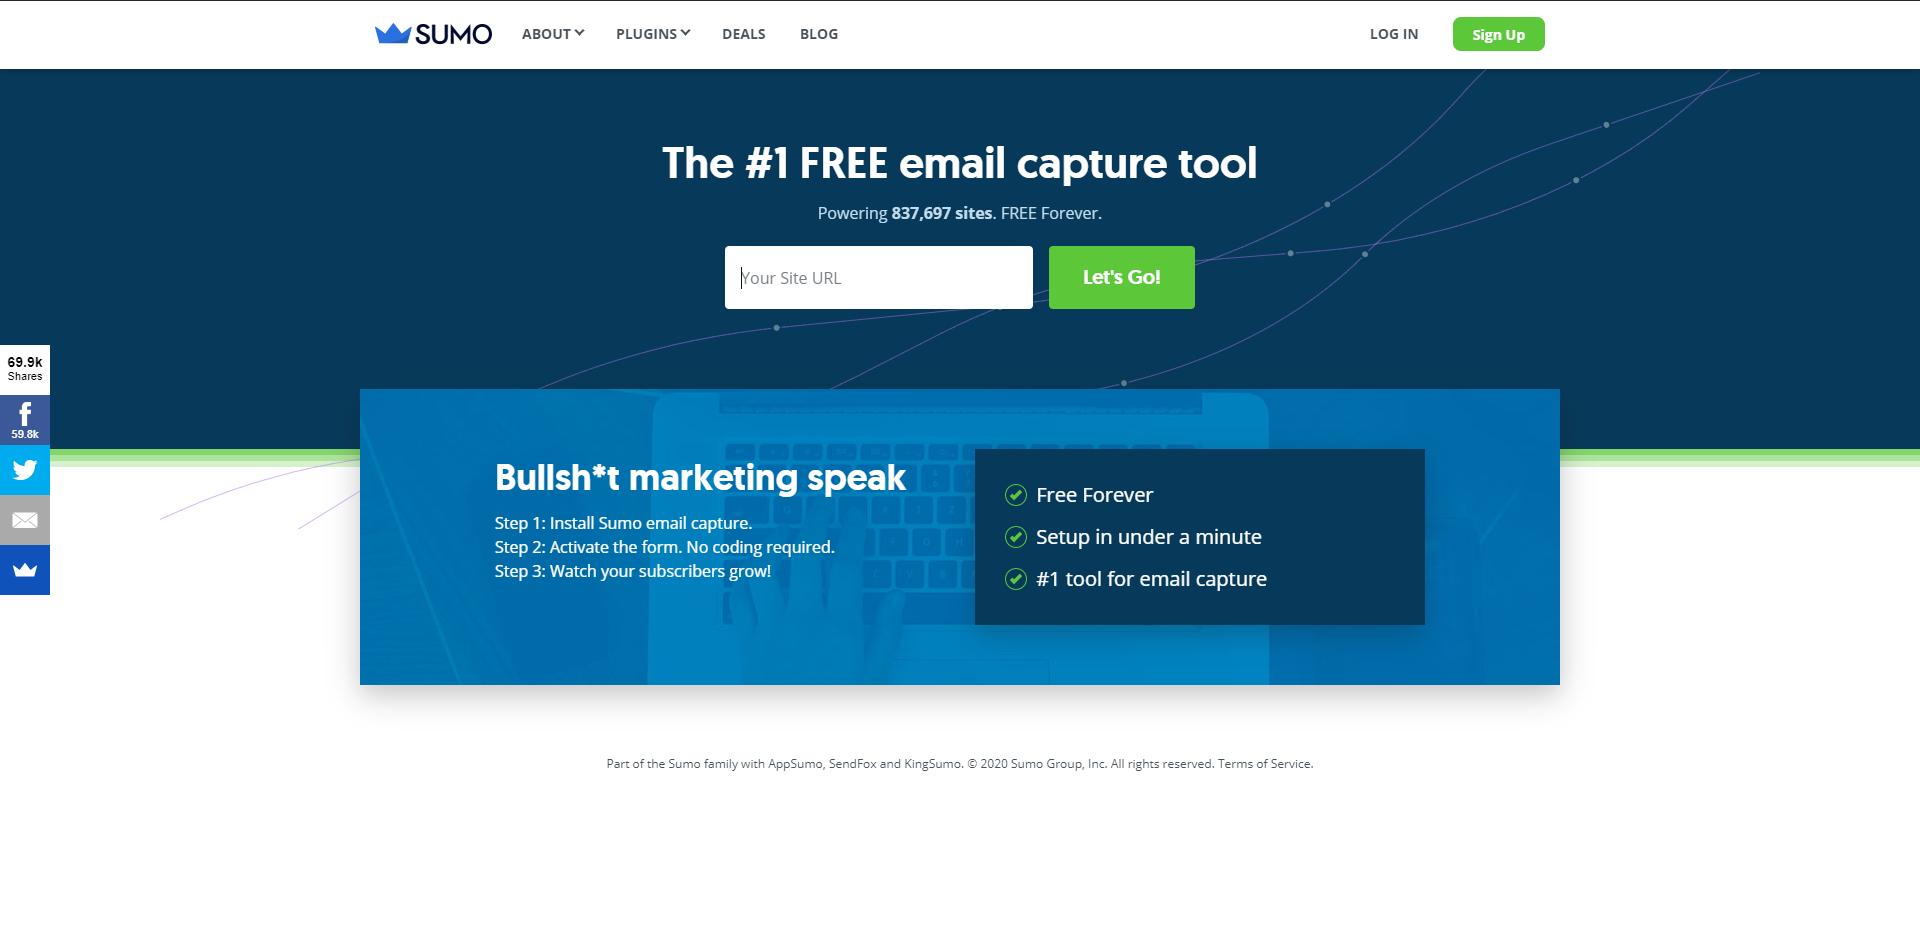 Sumo email capturing tool